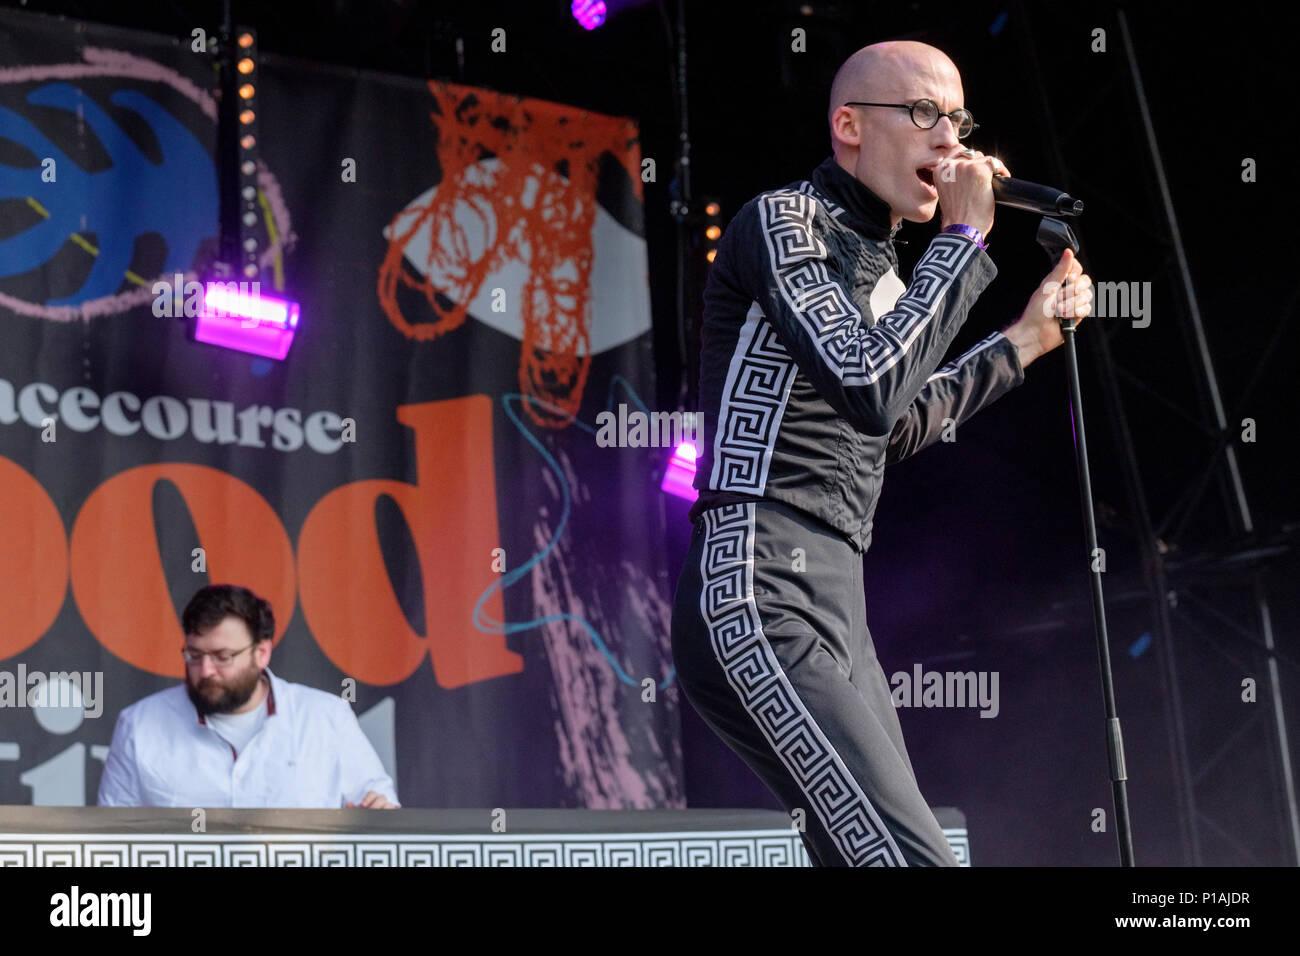 The Correspondents (DJ Chucks and Mr Bruce) perform at the Wychwood Festival, Cheltenham, UK. June 3, 2018 Stock Photo